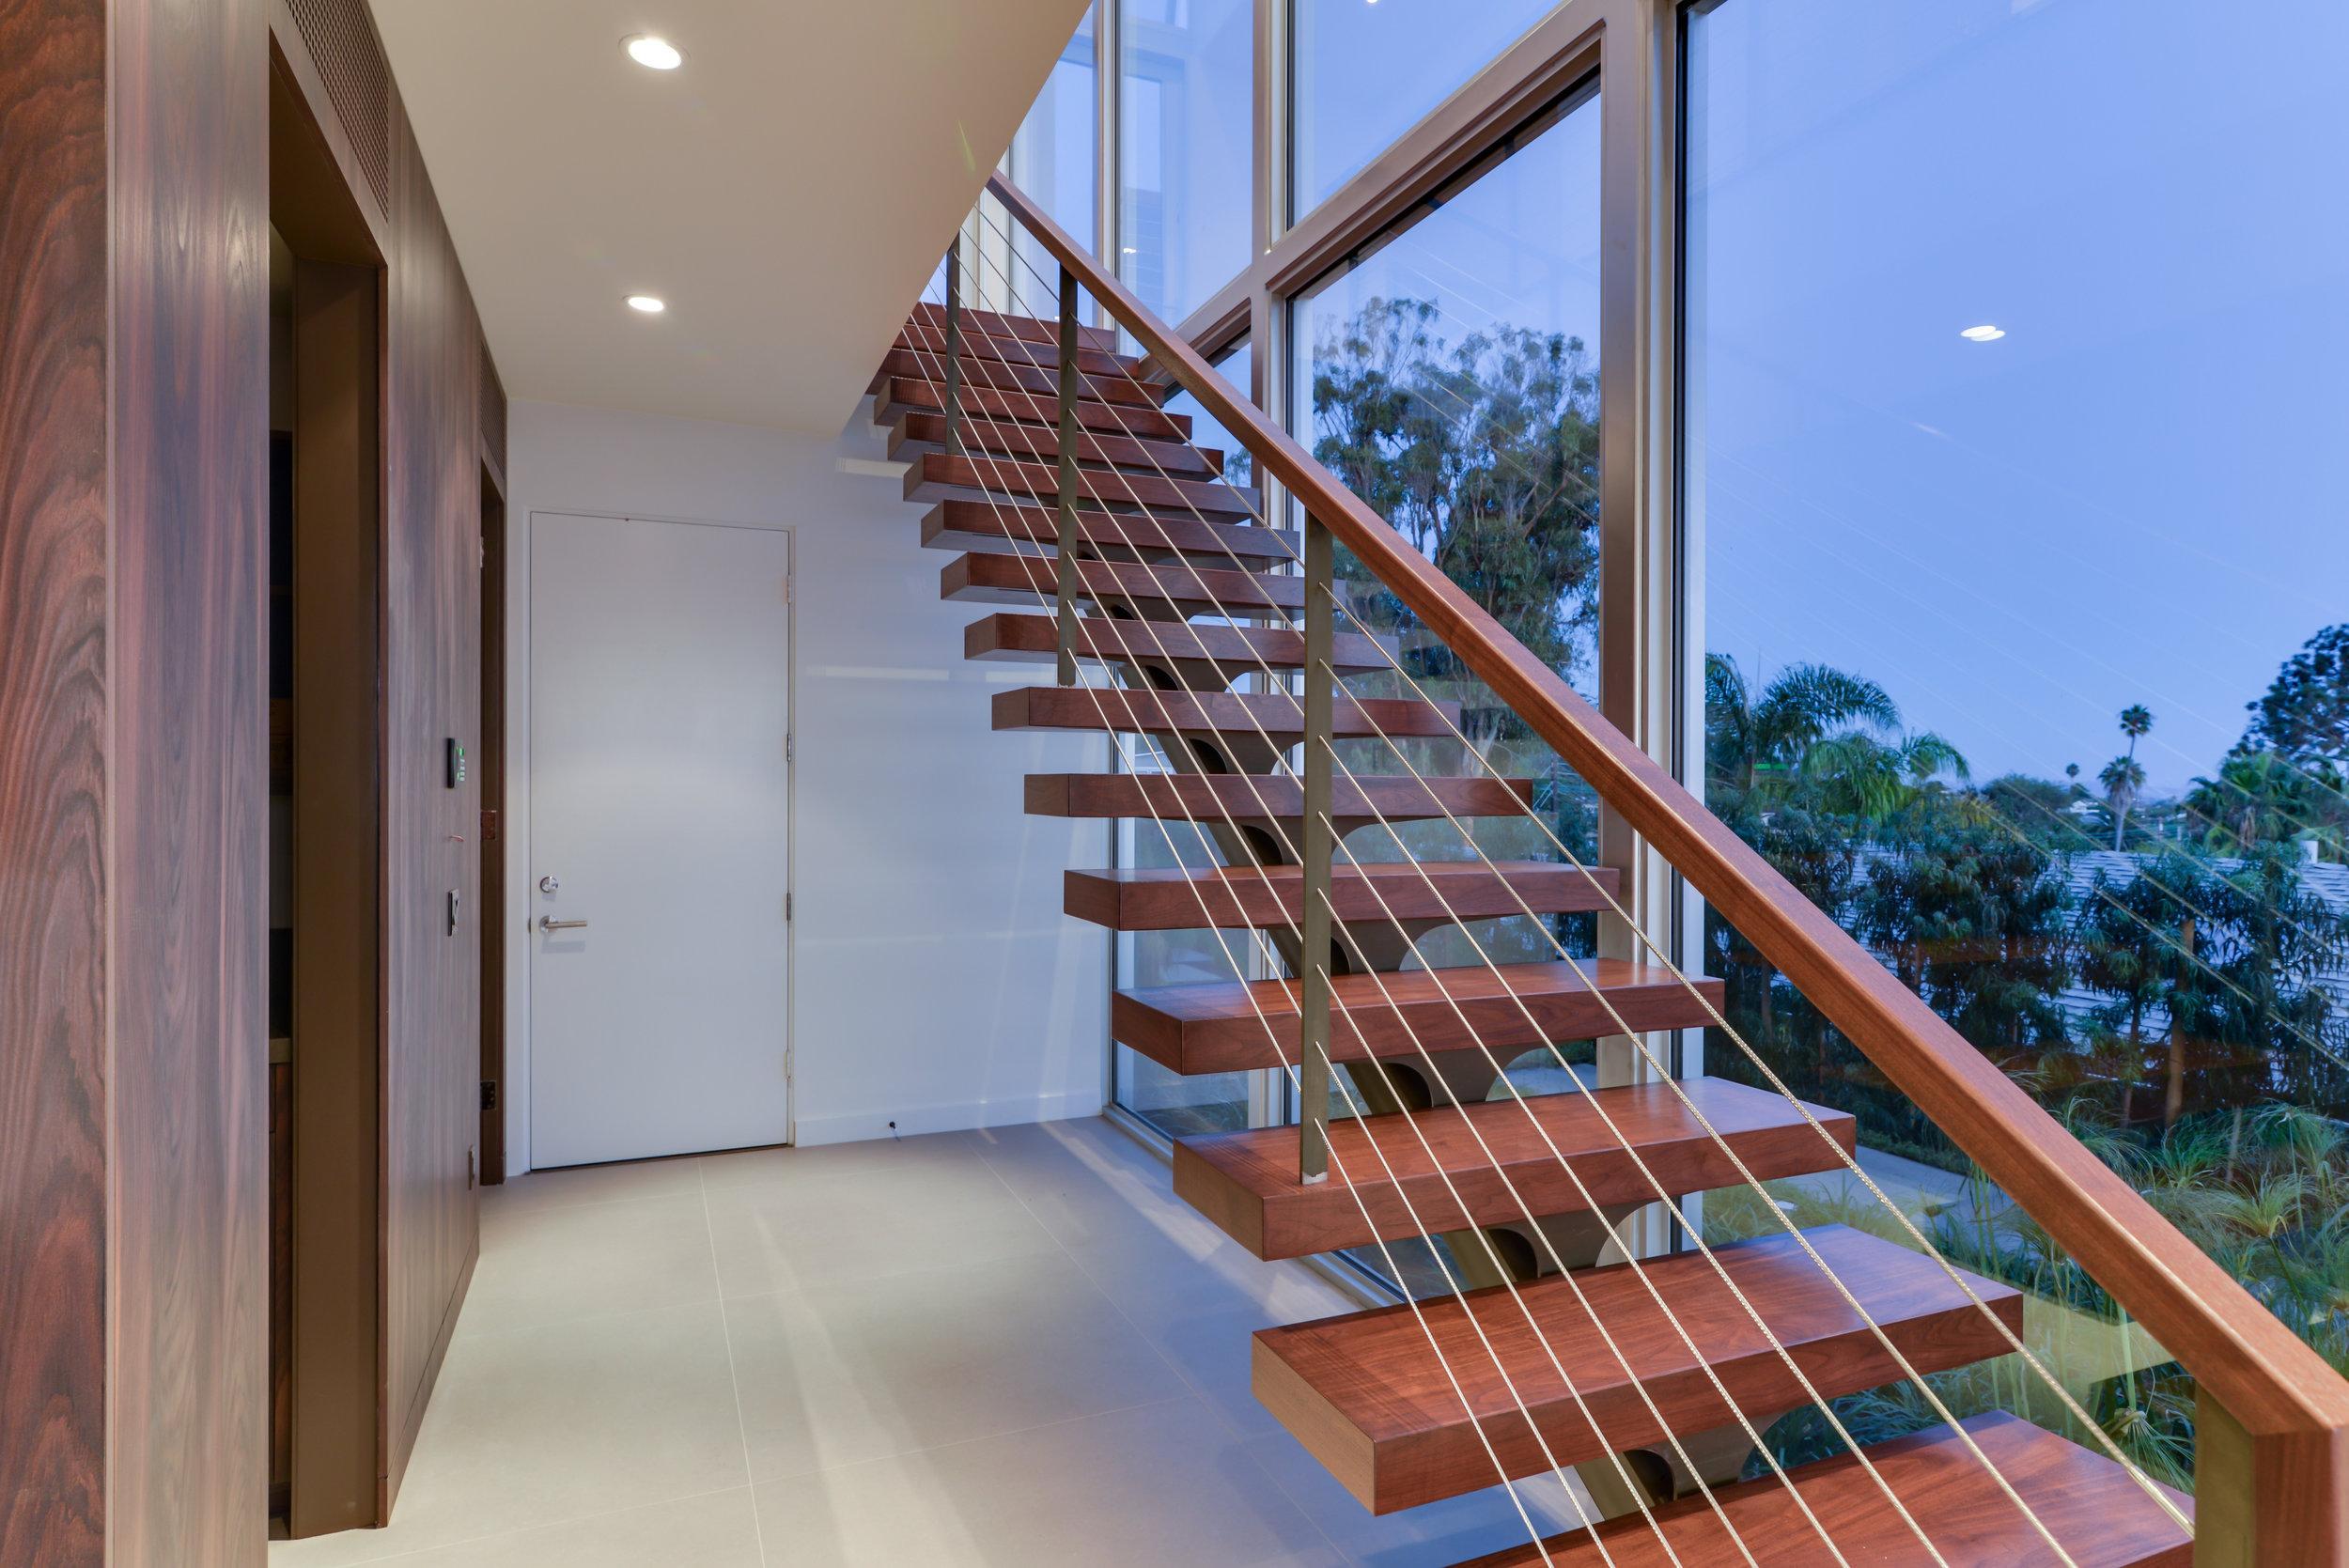 S.E.A.-Studio-Environmental-Architecture-David-Hertz-FAIA-Linda-Rosa-House-La-Jolla-San-Diego-sustainable-regenerative-restorative-design-modern-residential-mindful-garden-panoramic-ocean-view-open-concept-california-dream-14.jpg